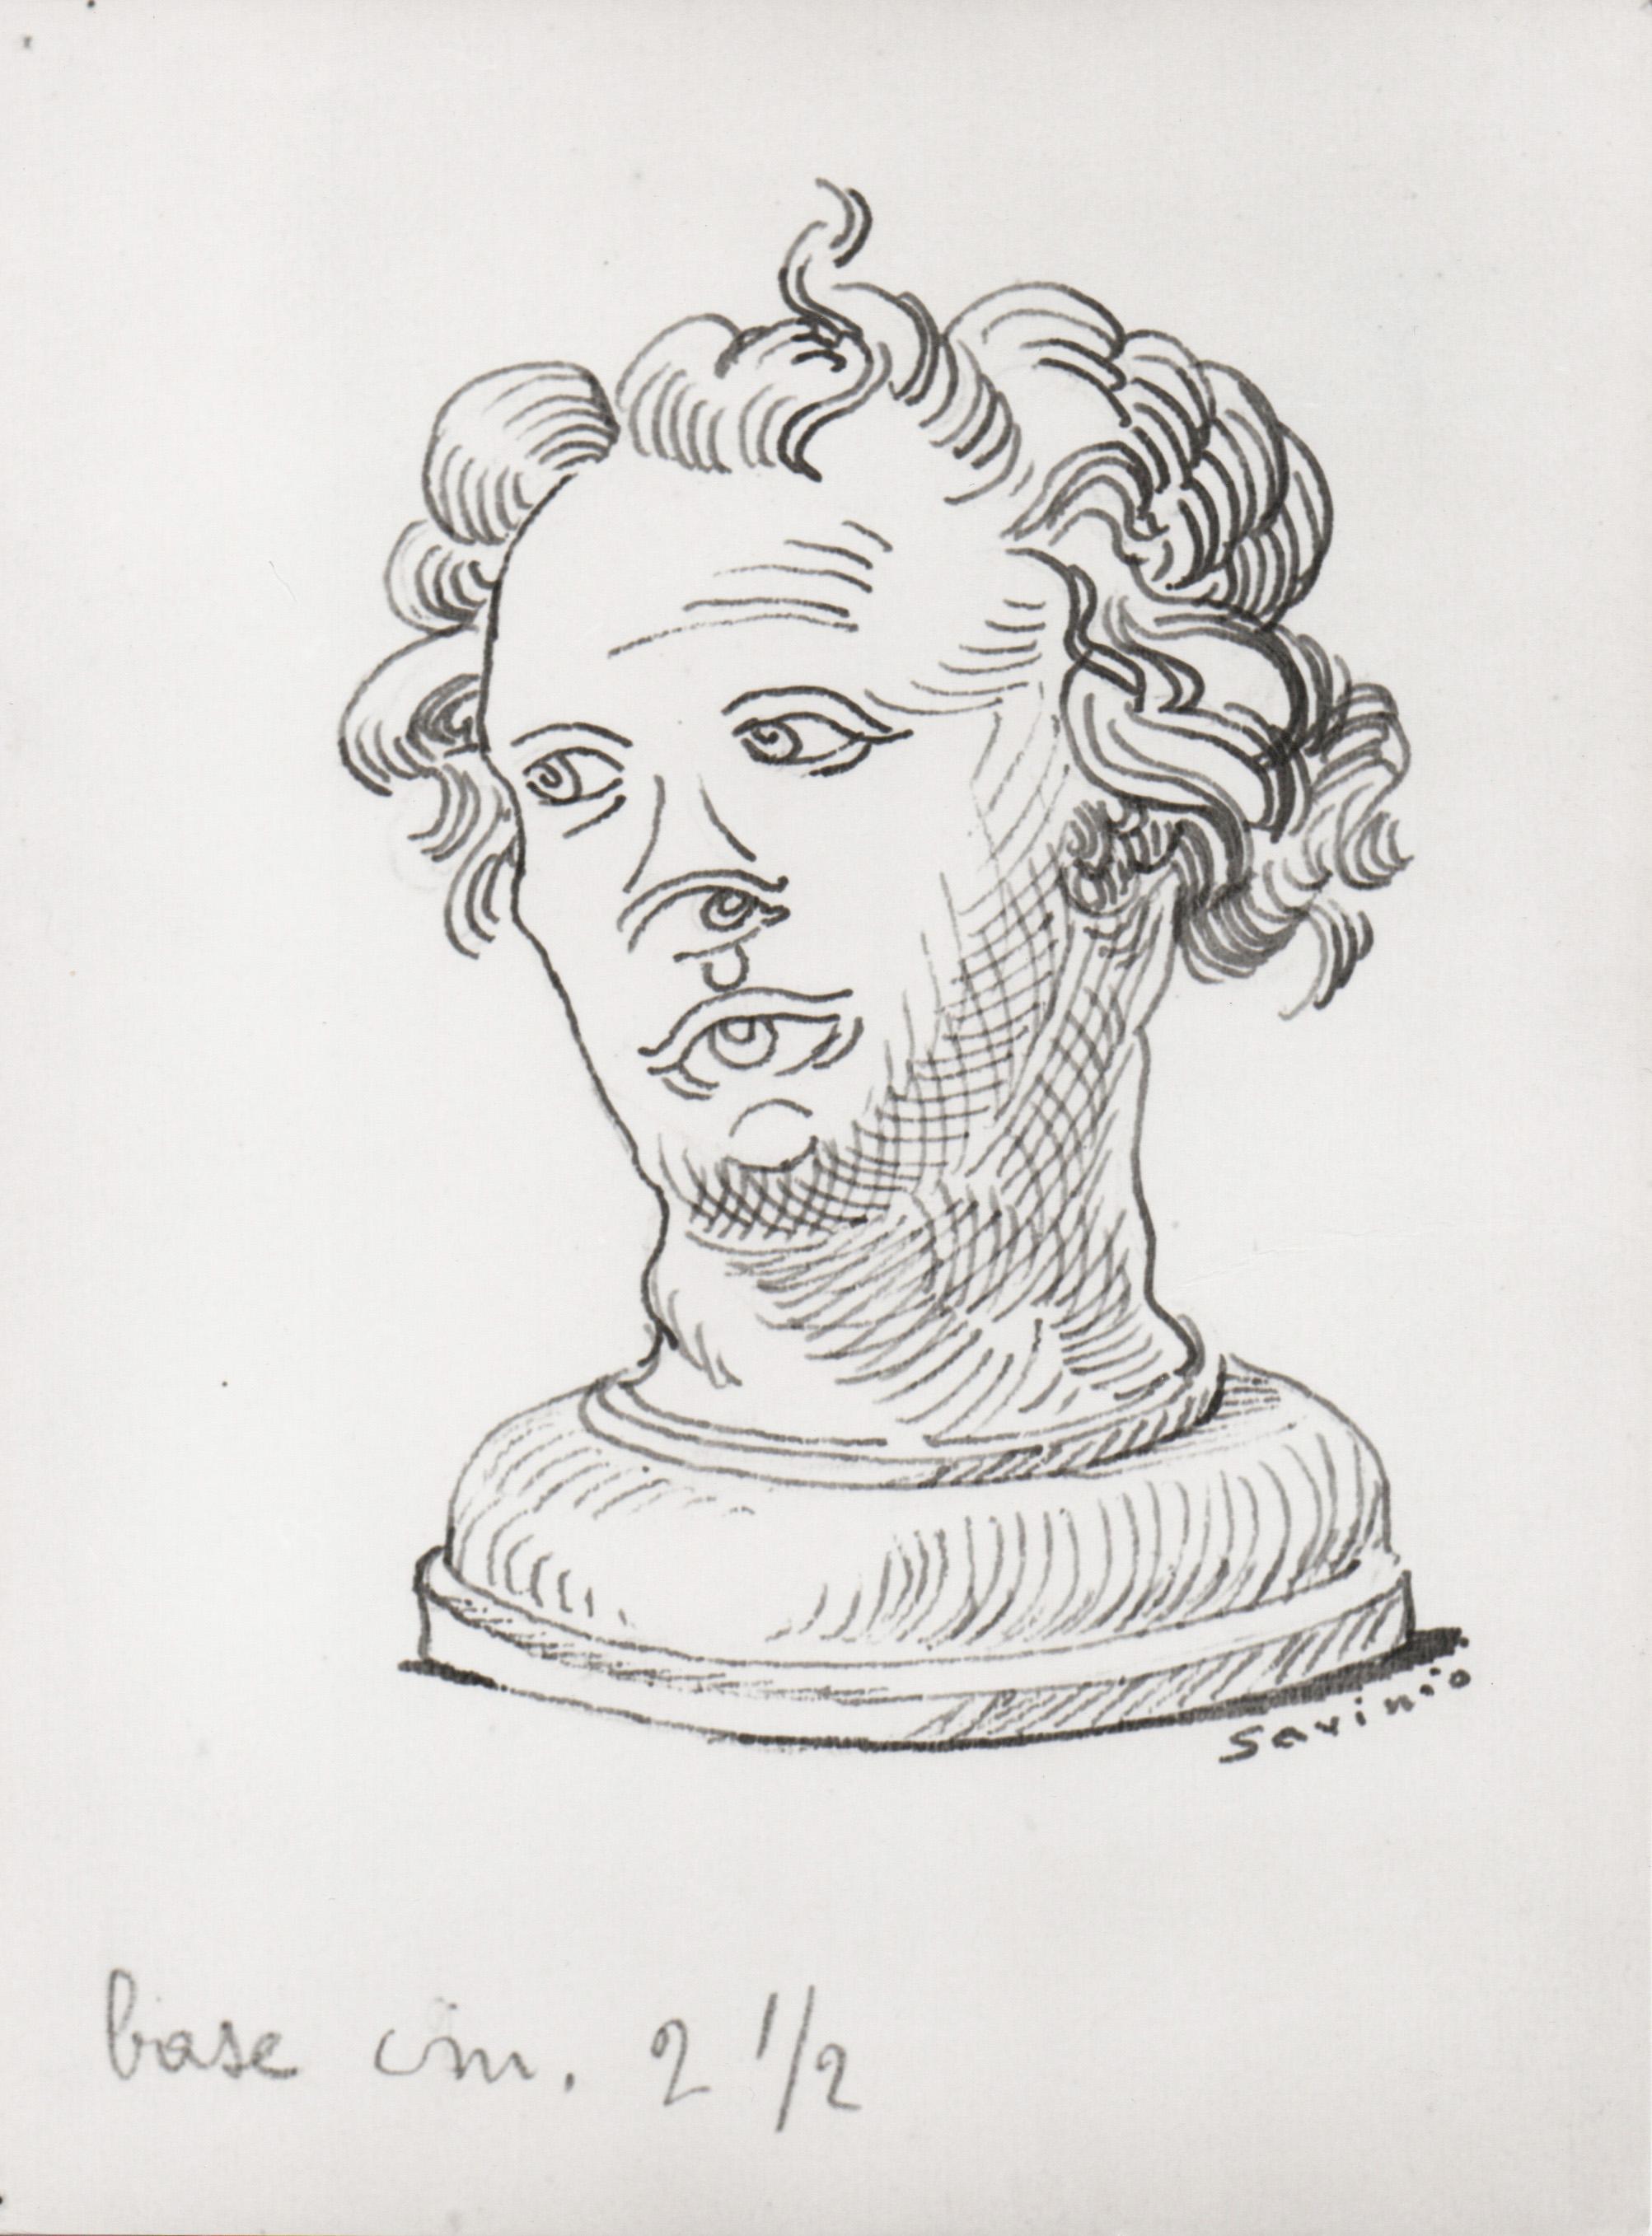 1942-3, 46, p.317, Storia vera – Cul-de-lampe.jpg